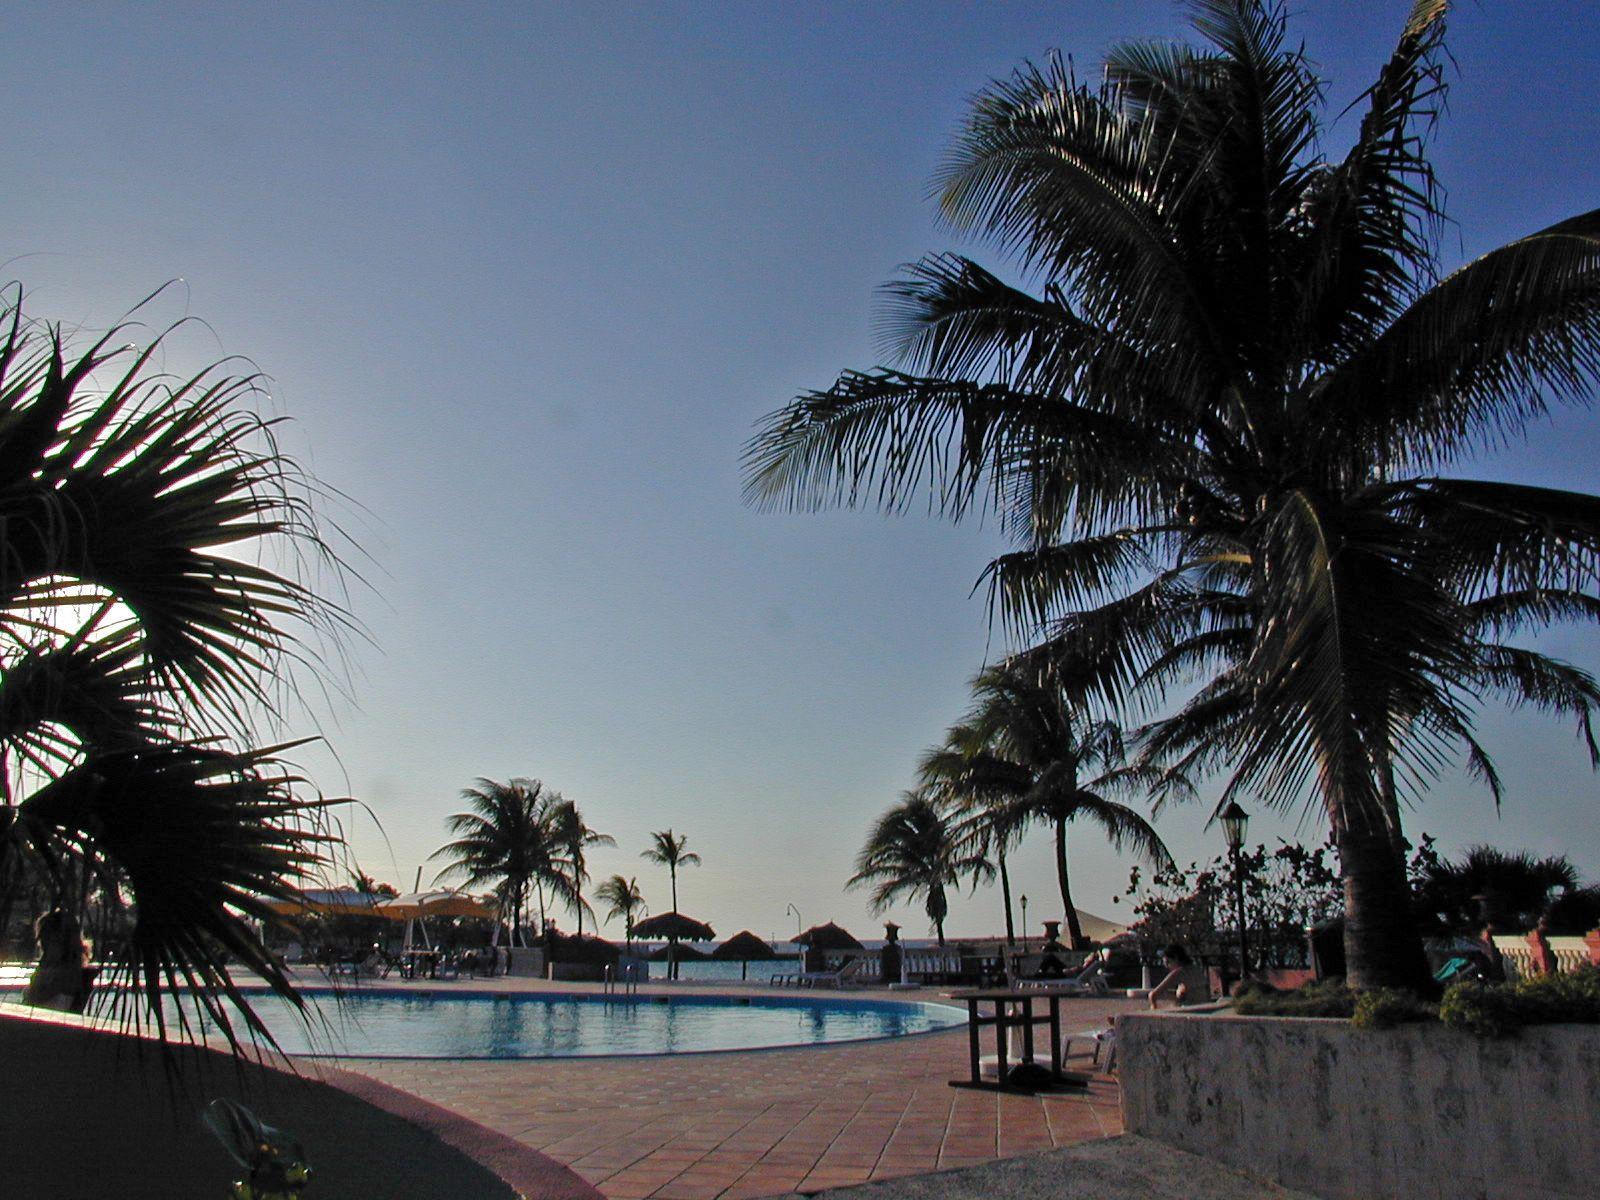 Surreal Pool Image at Club Habana, Havana, Cuba Cuba